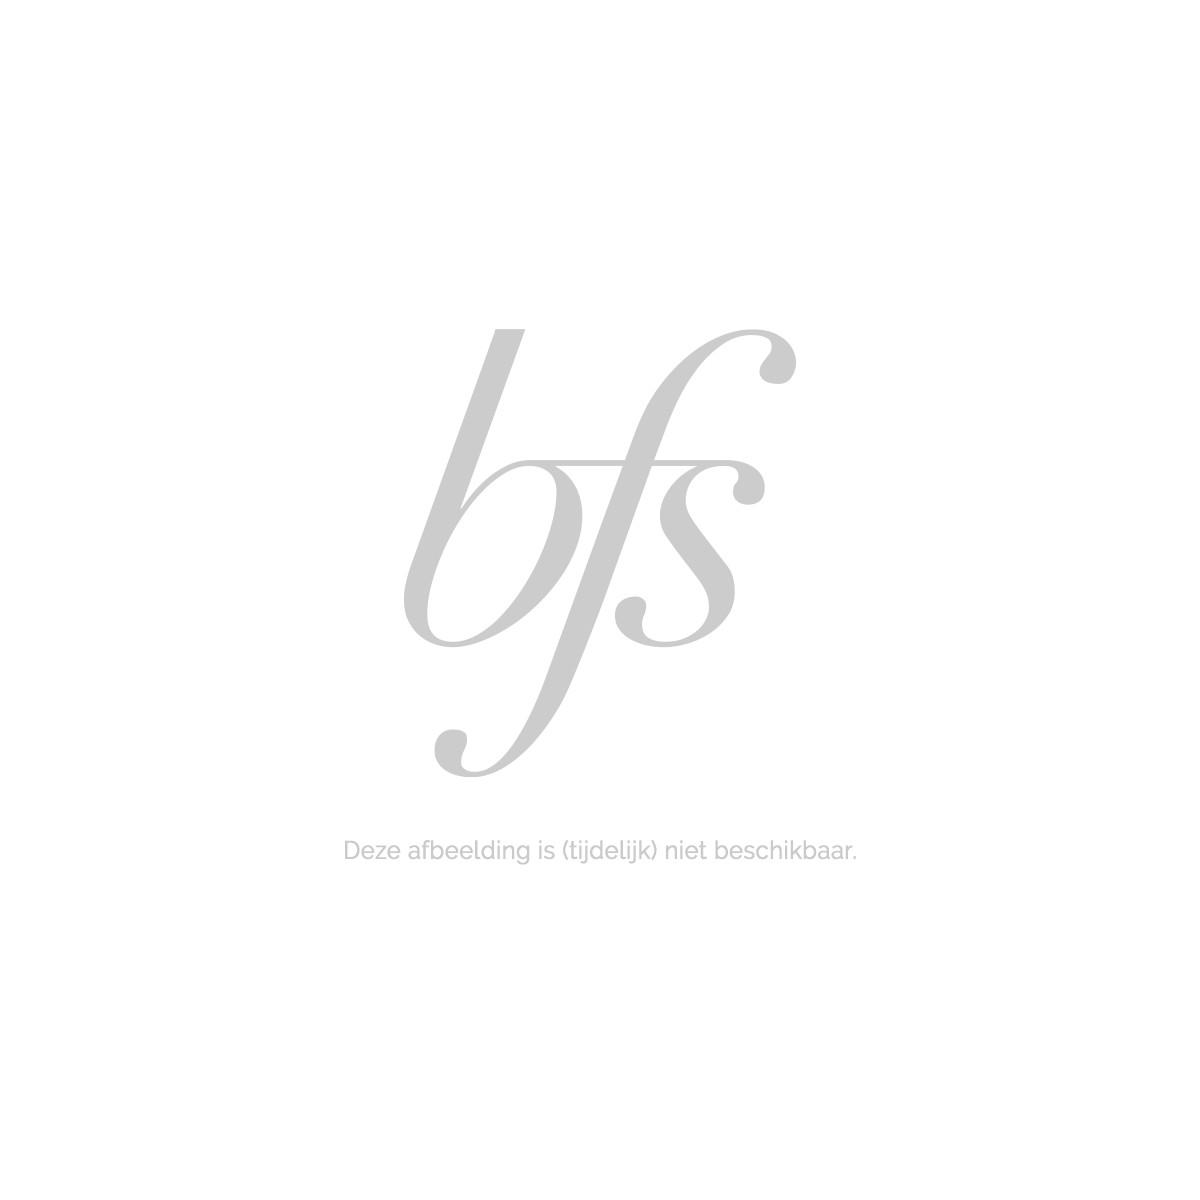 Givenchy Live Irresistible Eau De Parfum Spray 75 Ml